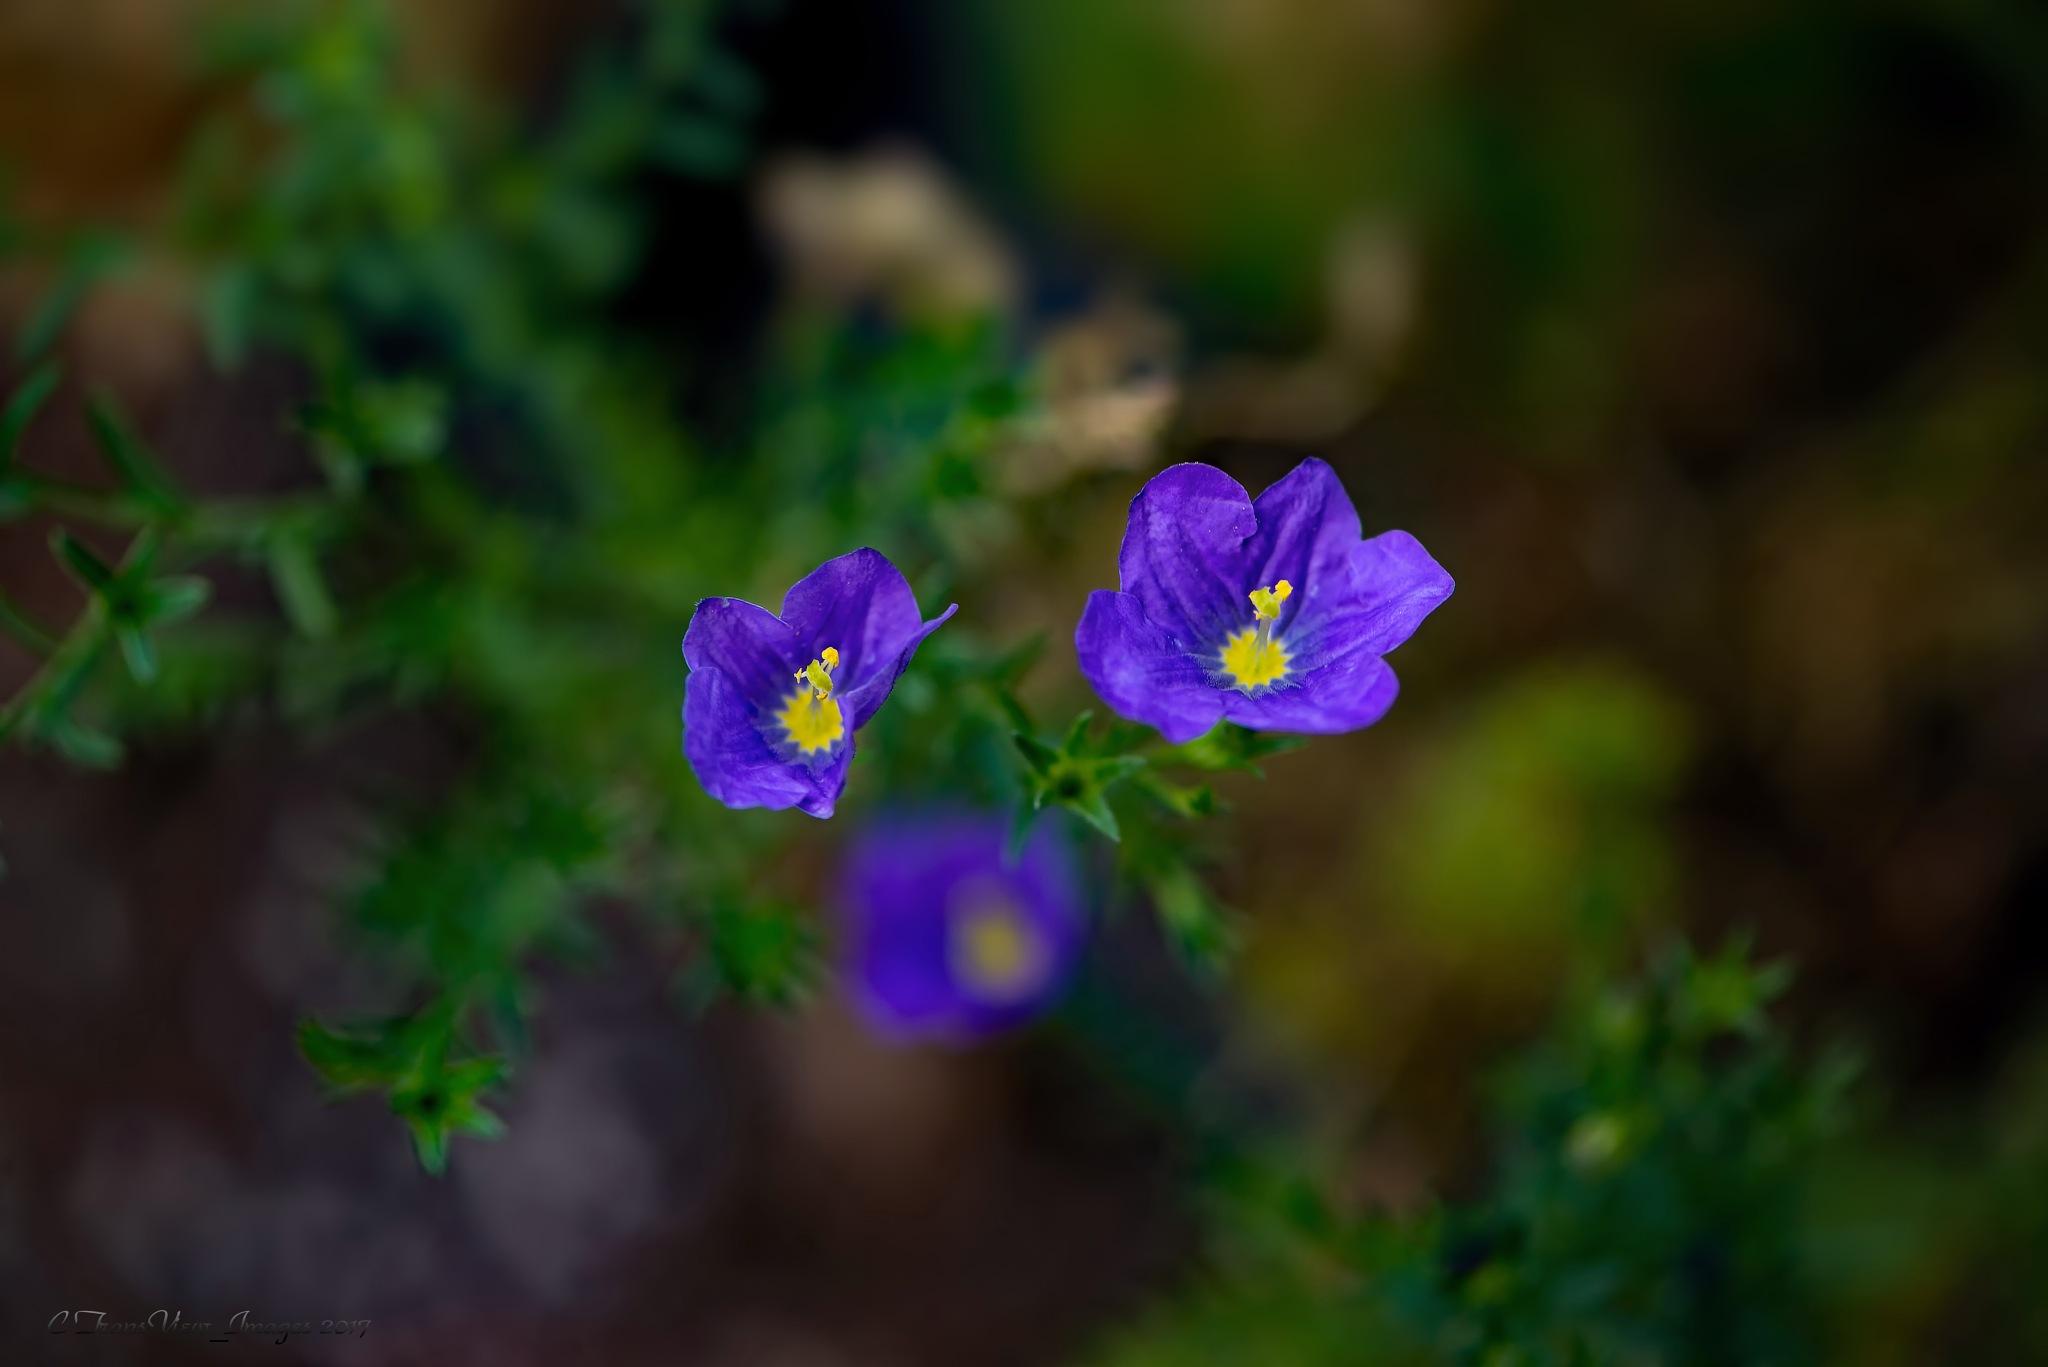 Cute tiny purple  flower by Transfiguracion Images